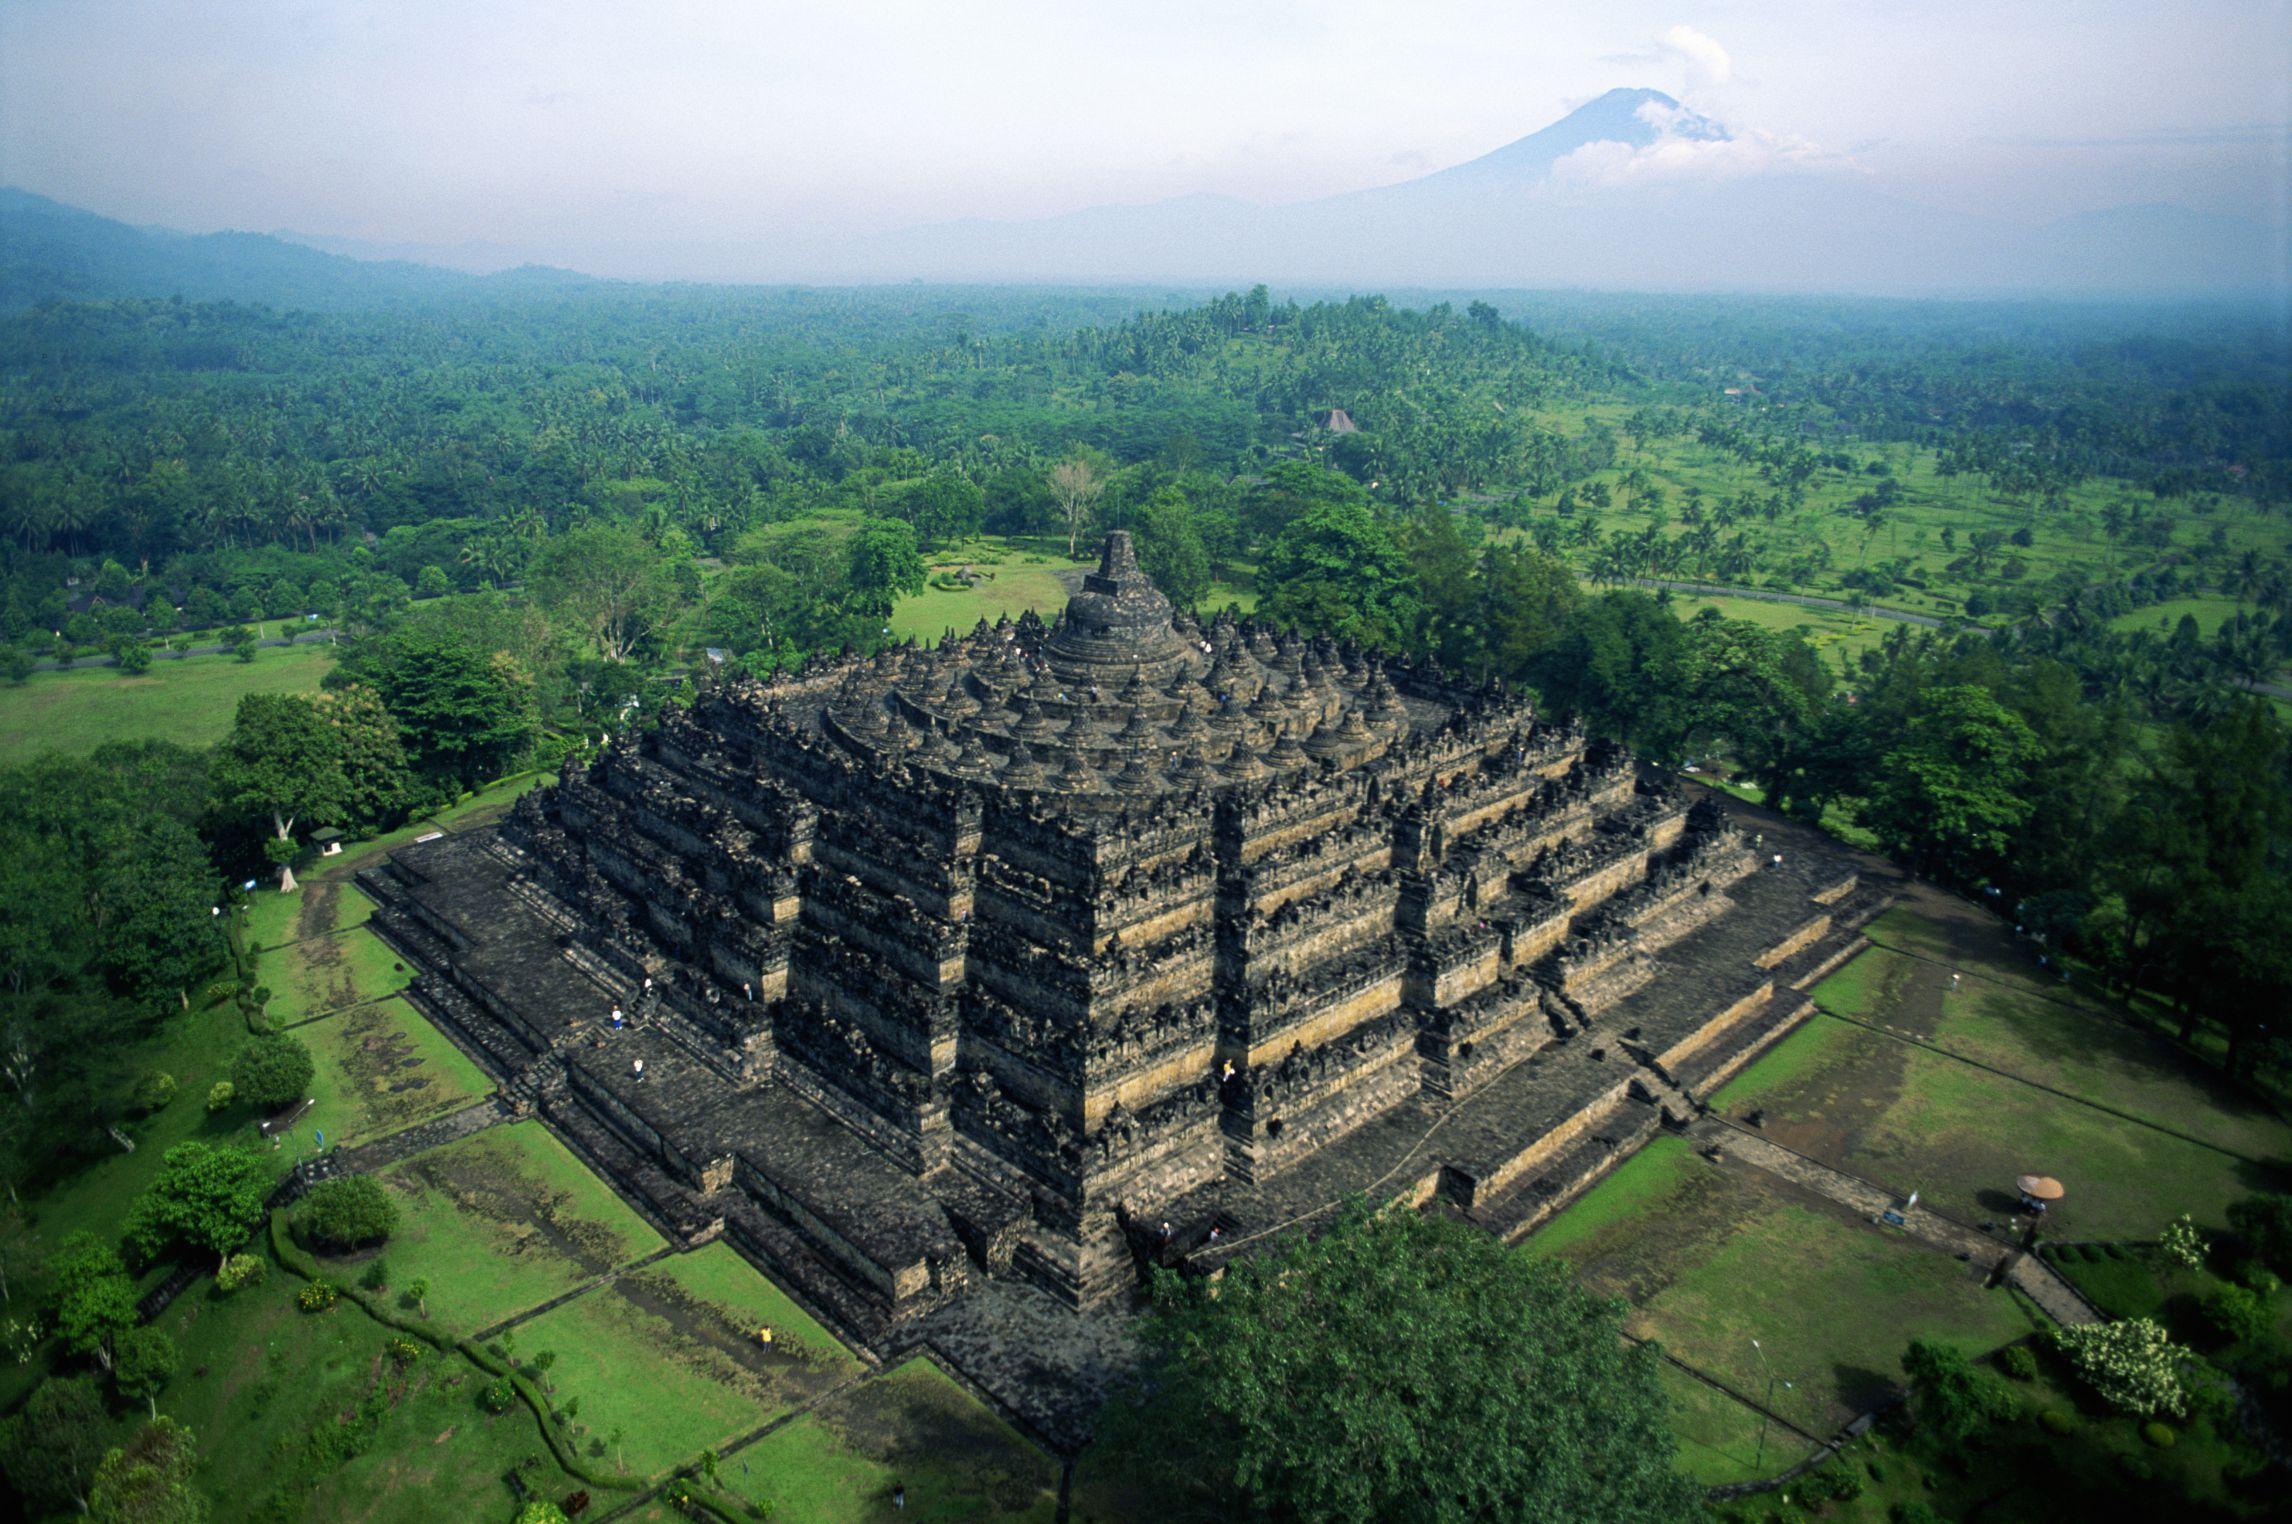 The Shailendra Kingdom of Java